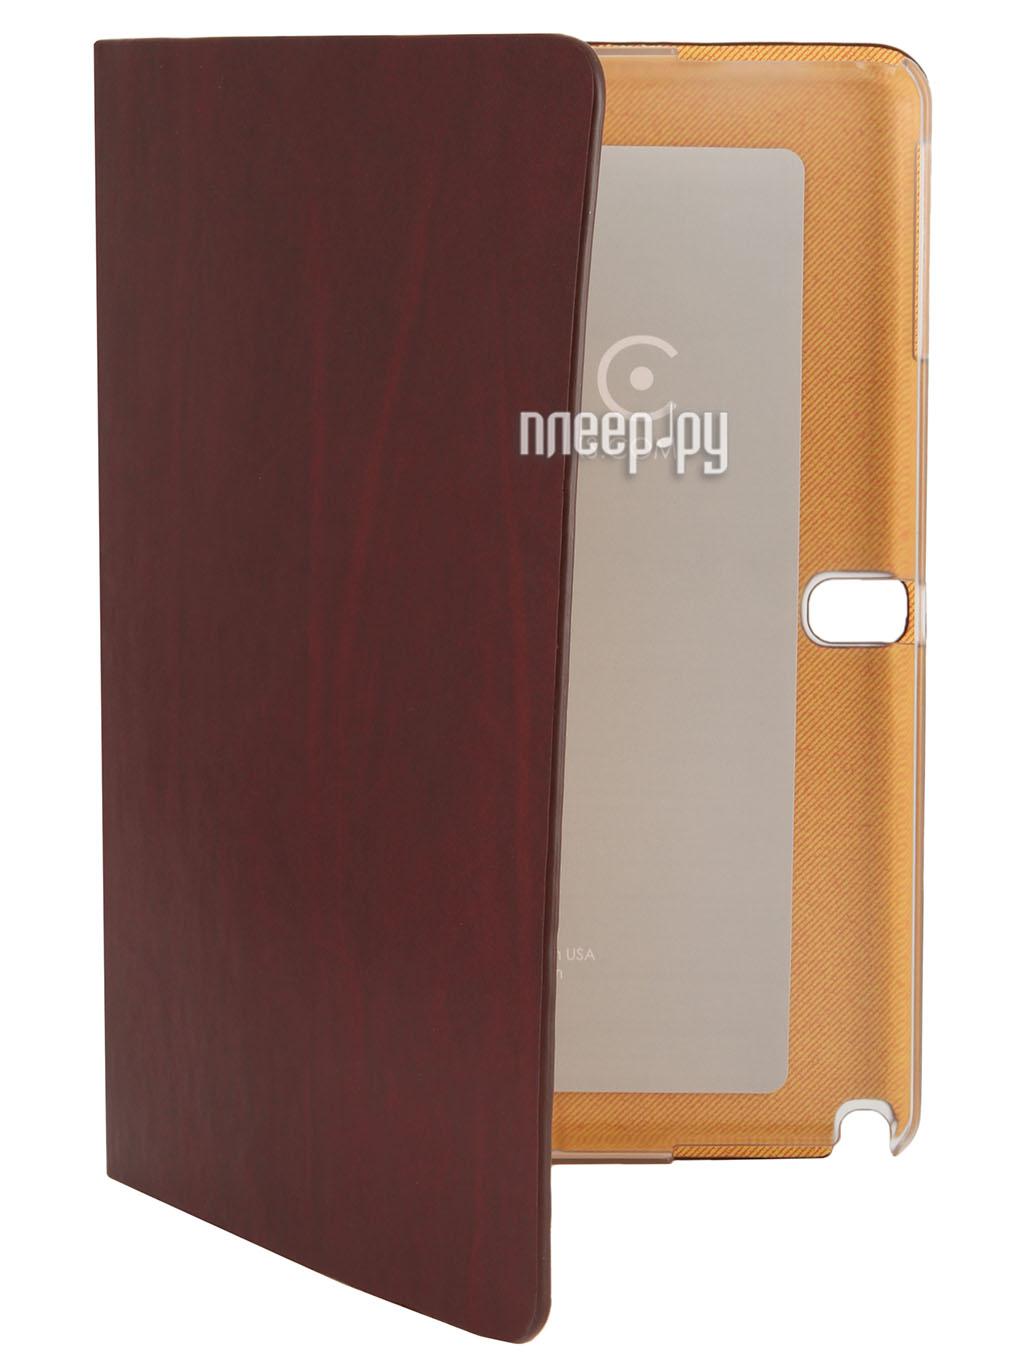 Аксессуар Чехол Samsung Galaxy Note 10.1 2014 Edition Zenus Avoc Toscana Diary Wine  Pleer.ru  1200.000